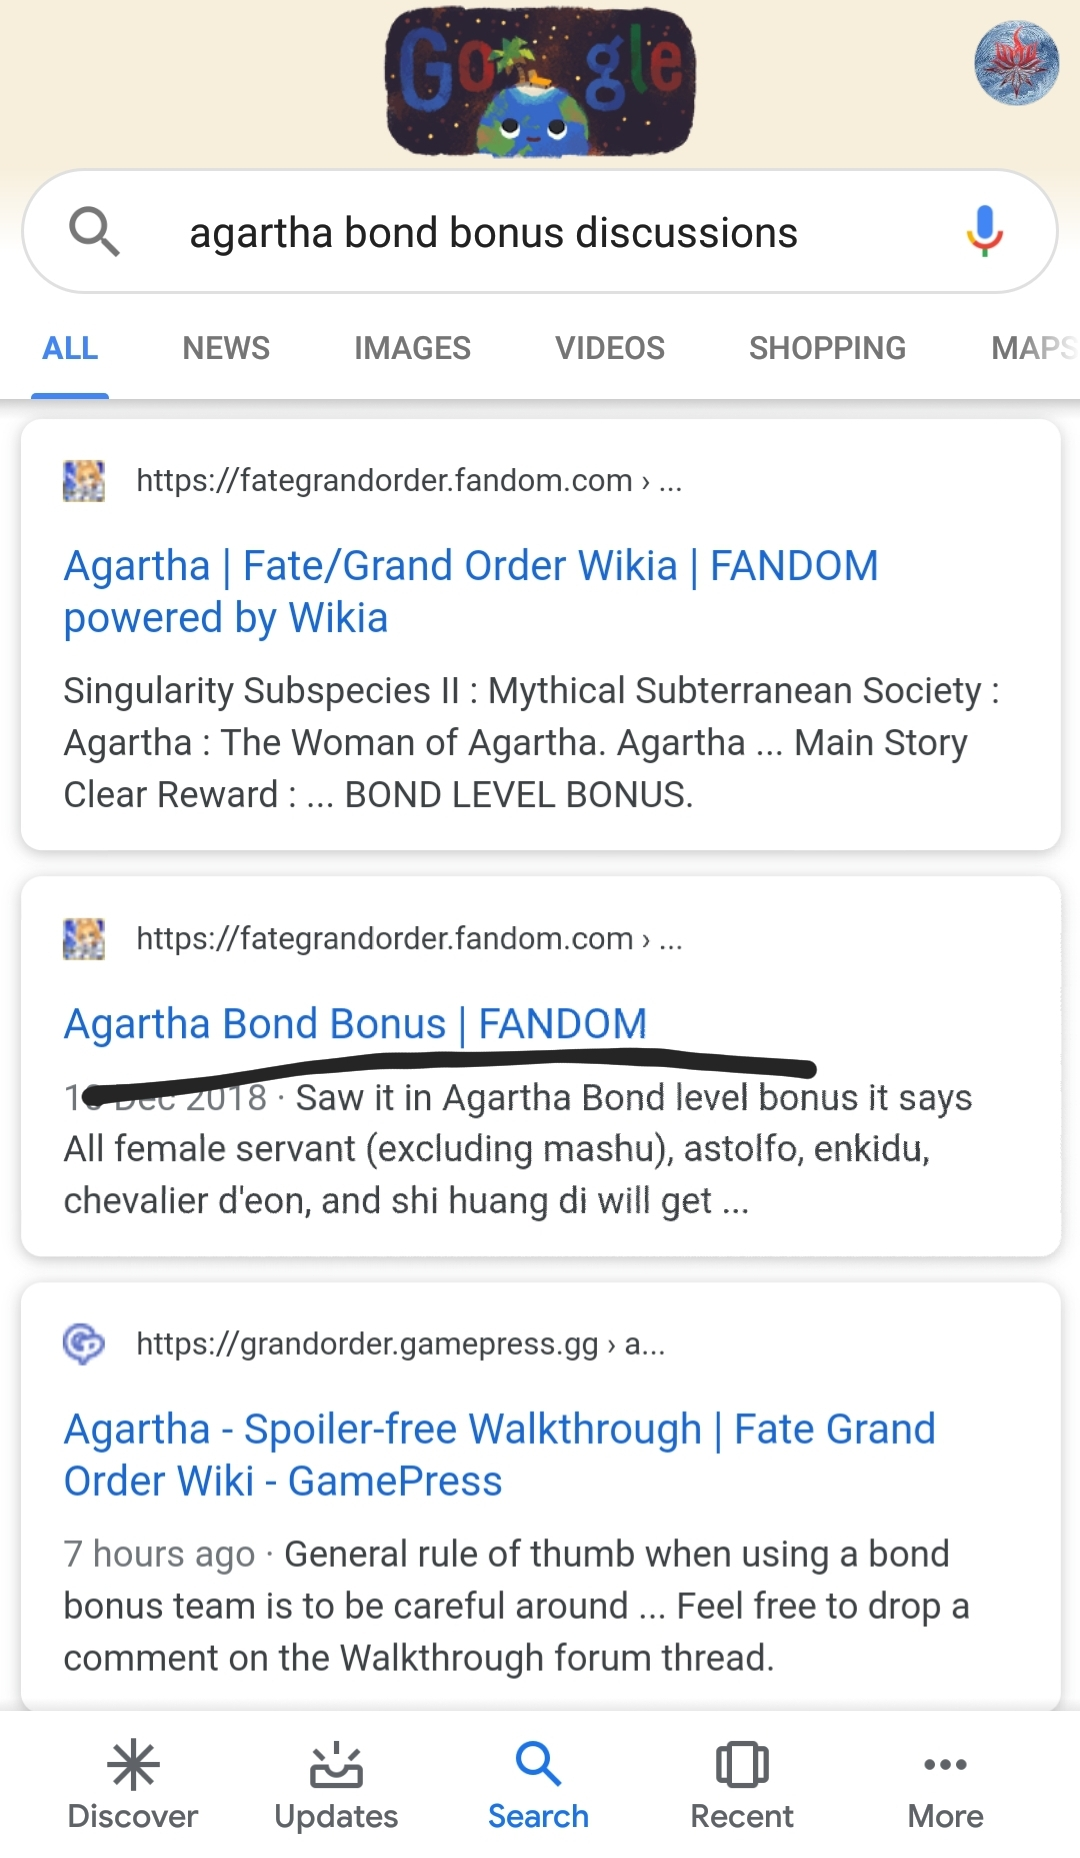 Agartha Bond Bonus | FANDOM